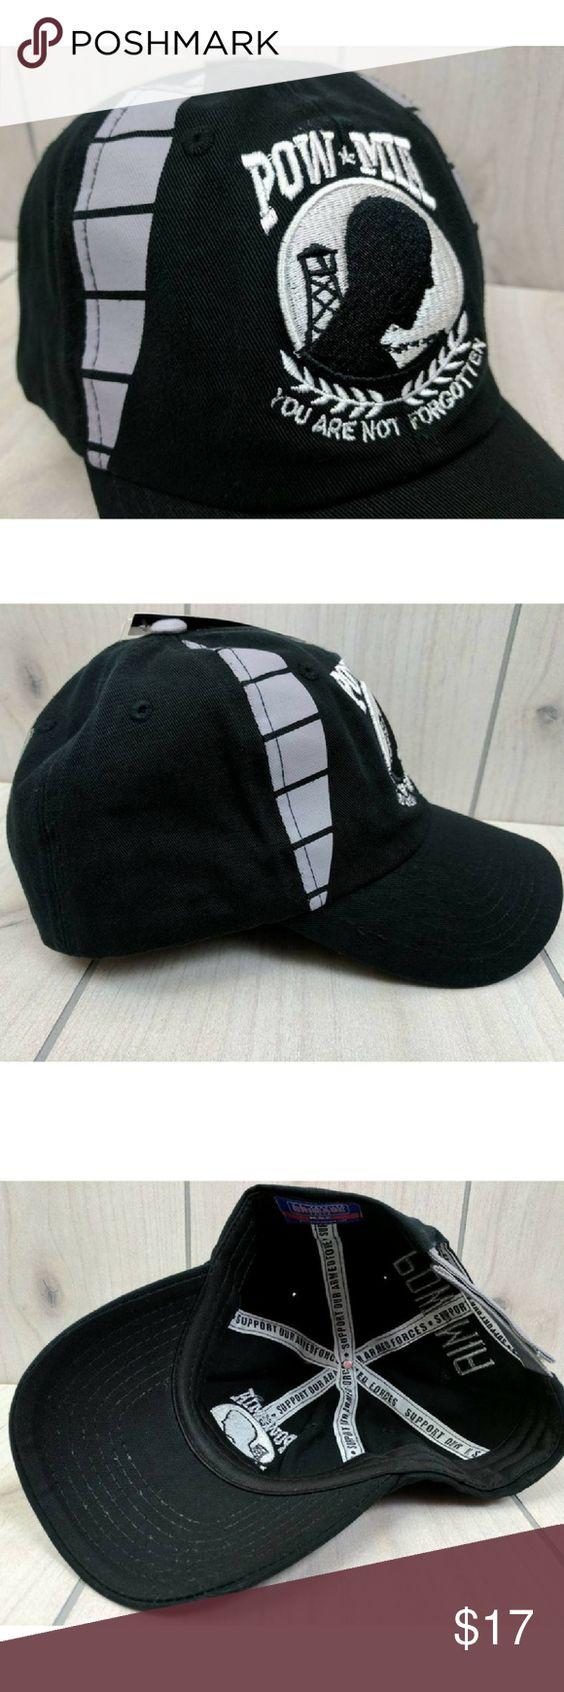 pow mia hat baseball cap adjustable nwt pow mia you are not forgotten hat adjustable - Pow Mia Hat